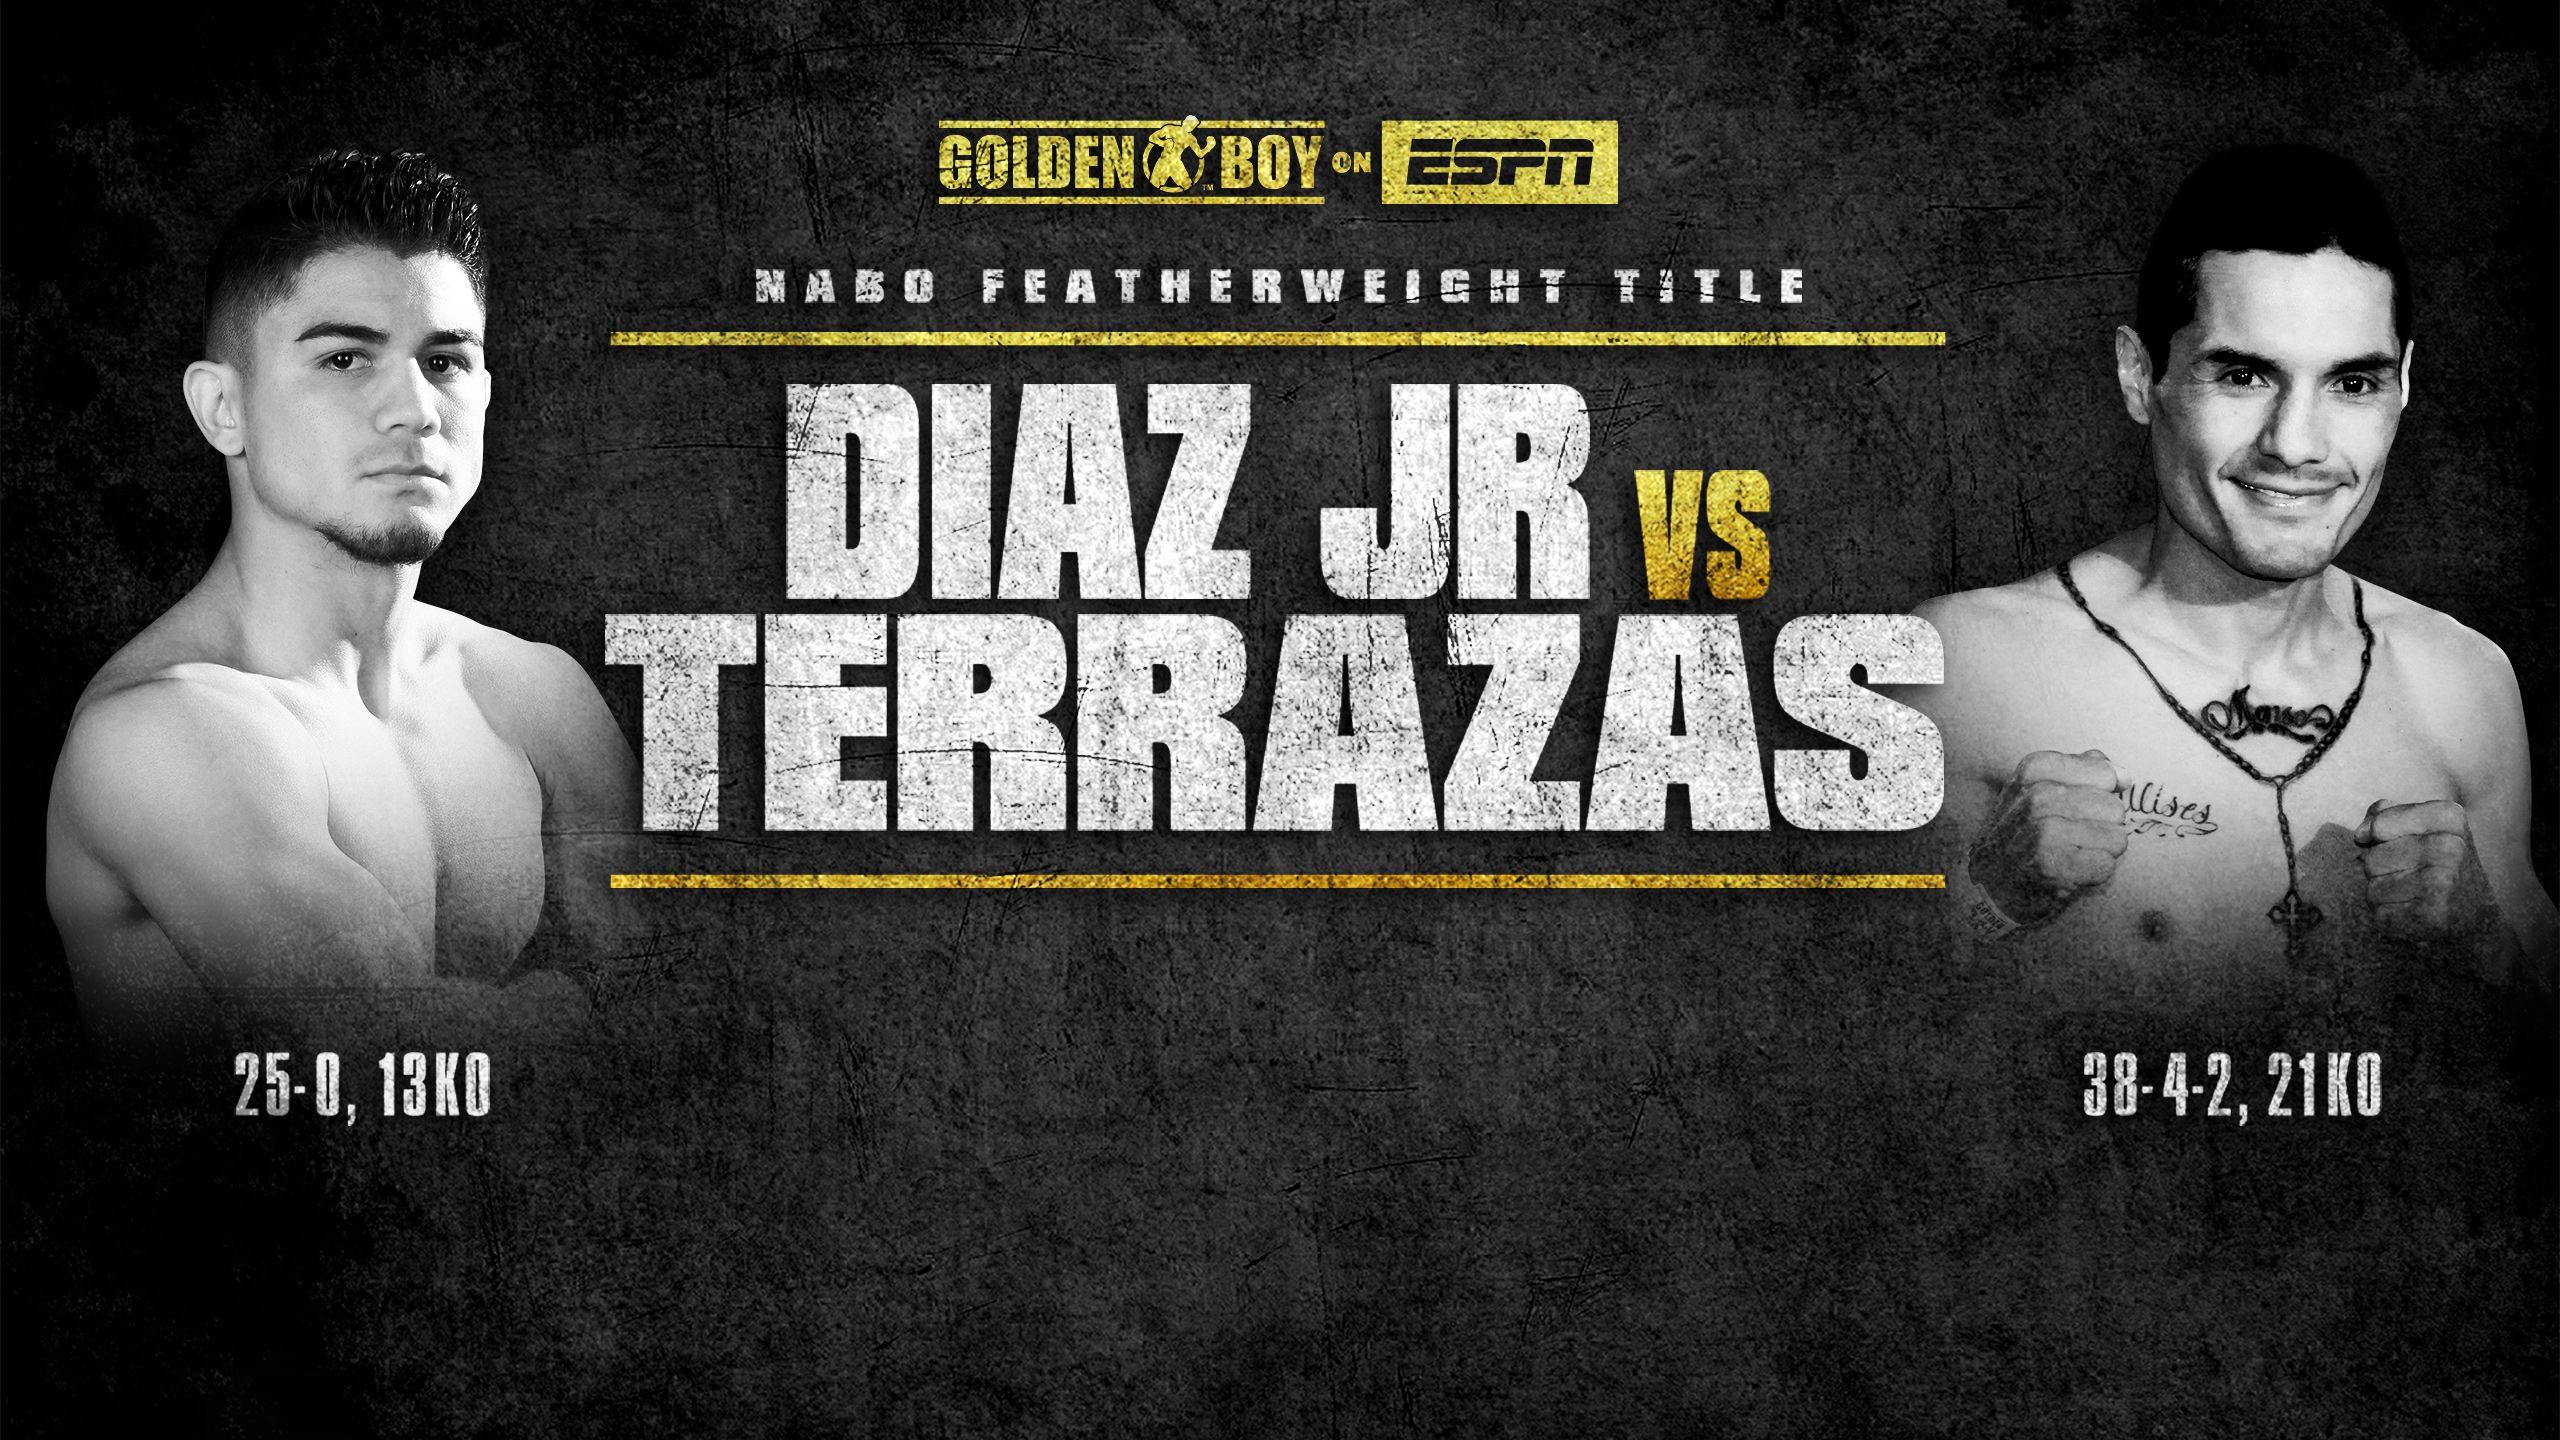 Joseph Diaz Jr. vs. Victor Terrazas